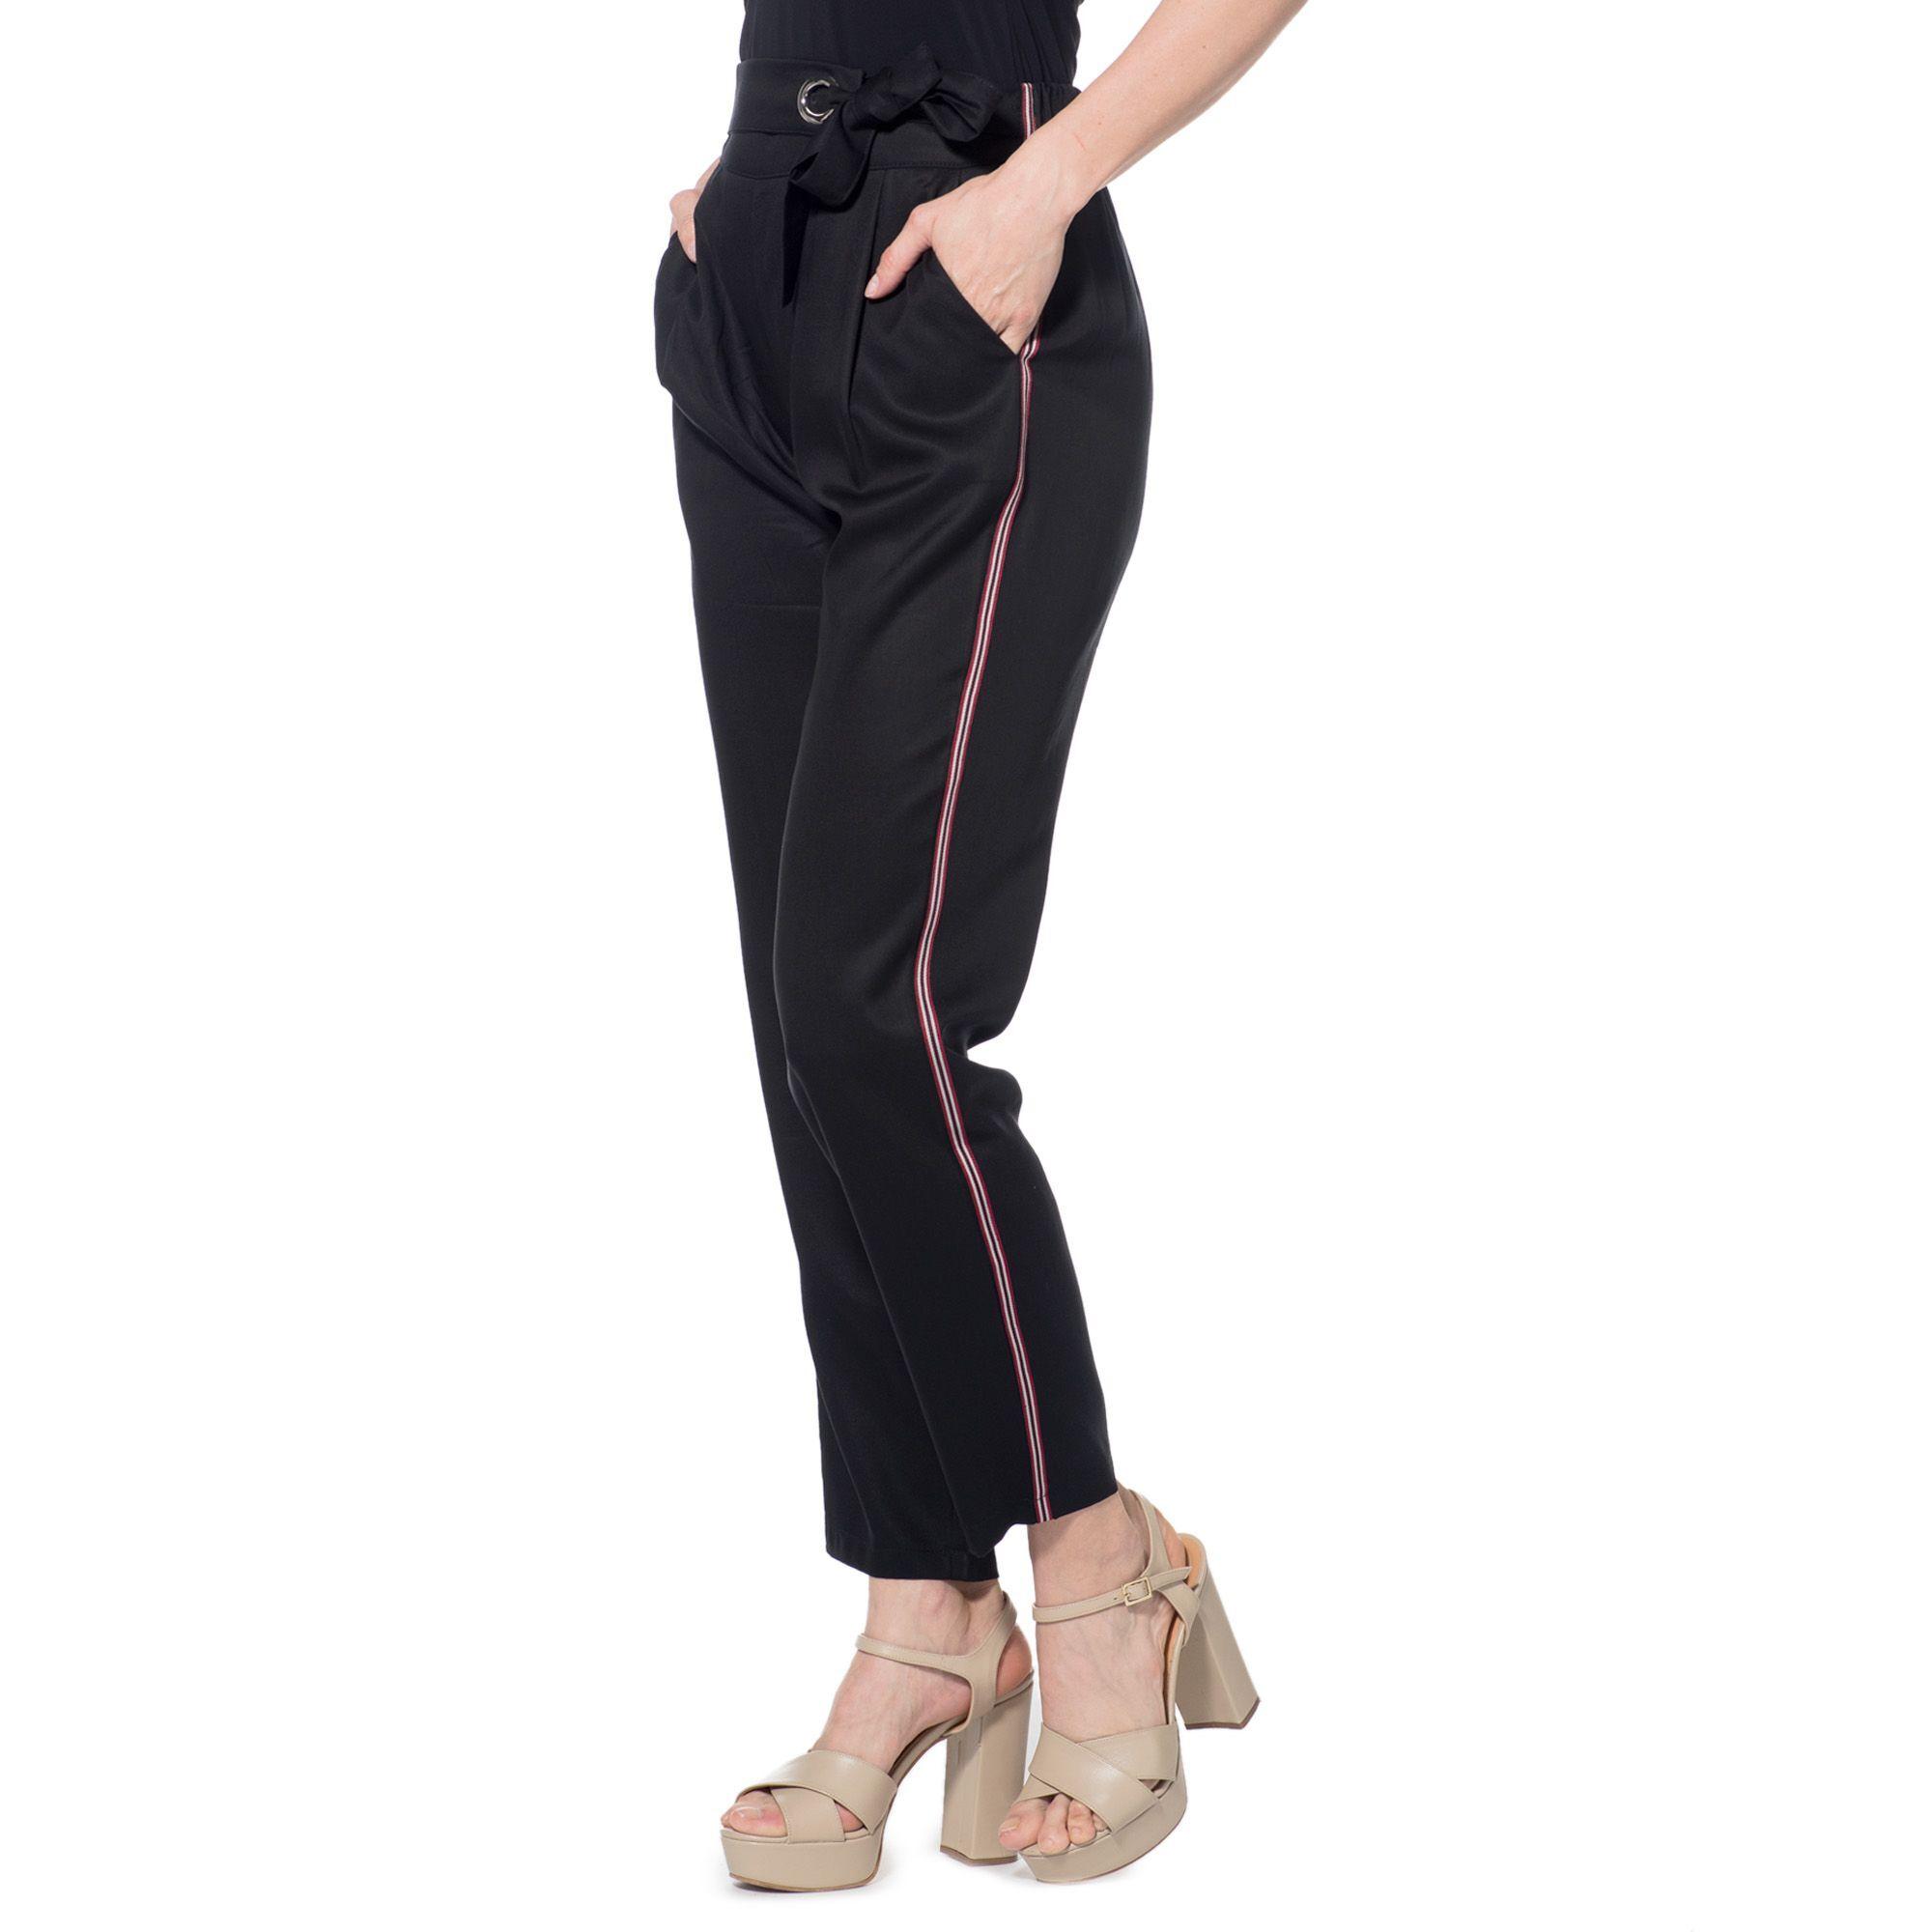 Officina della Moda Pantaloni jogger made in Italy in 100% lyocell